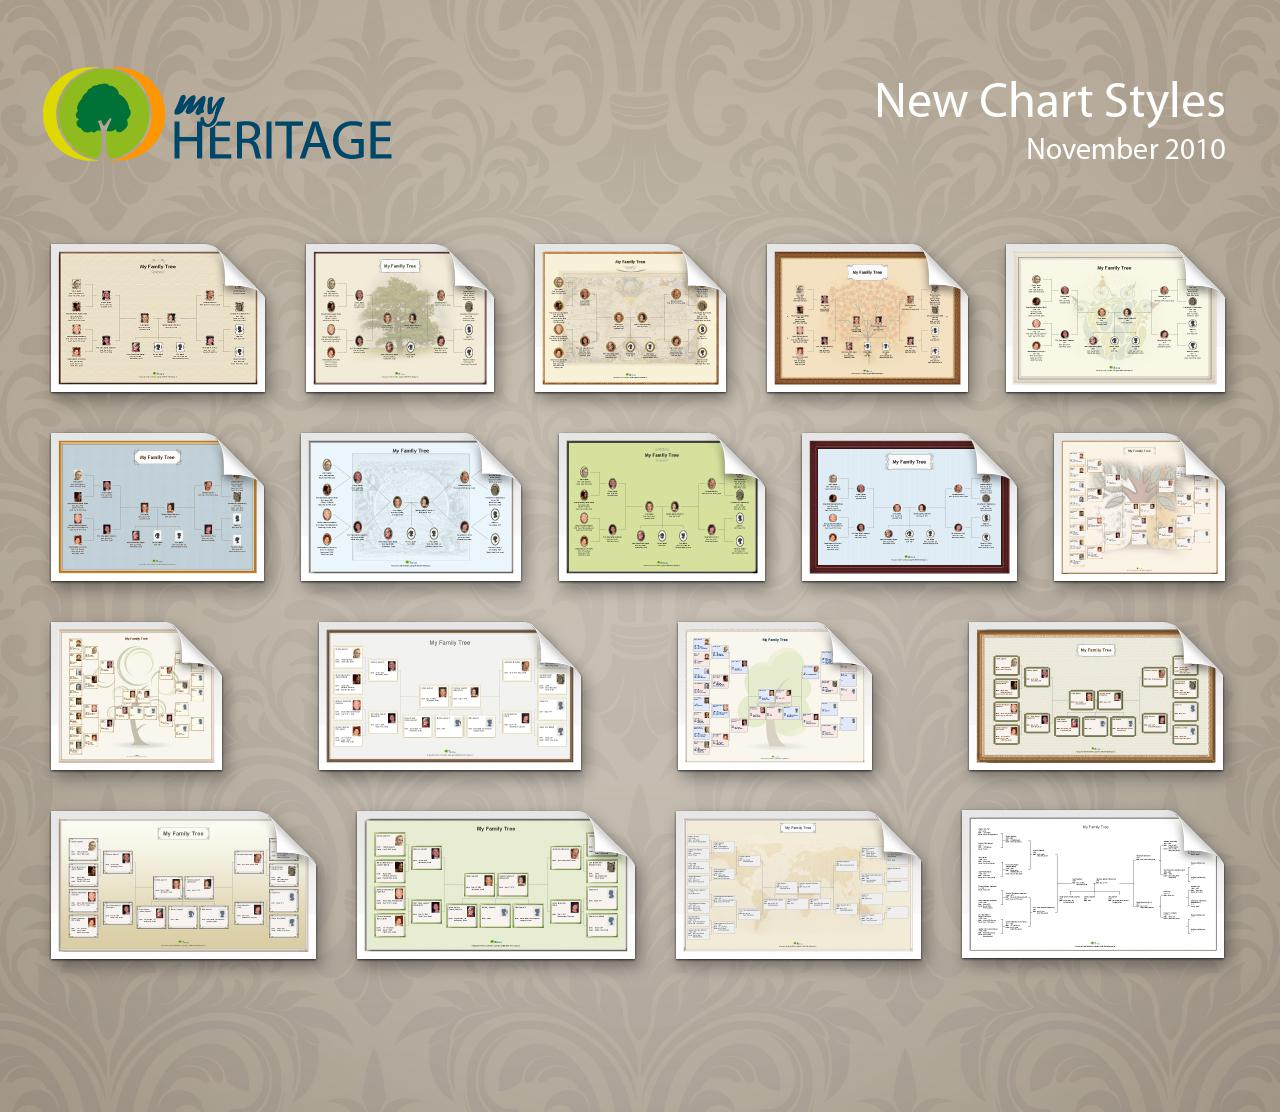 Chart Styles on MyHeritage.com